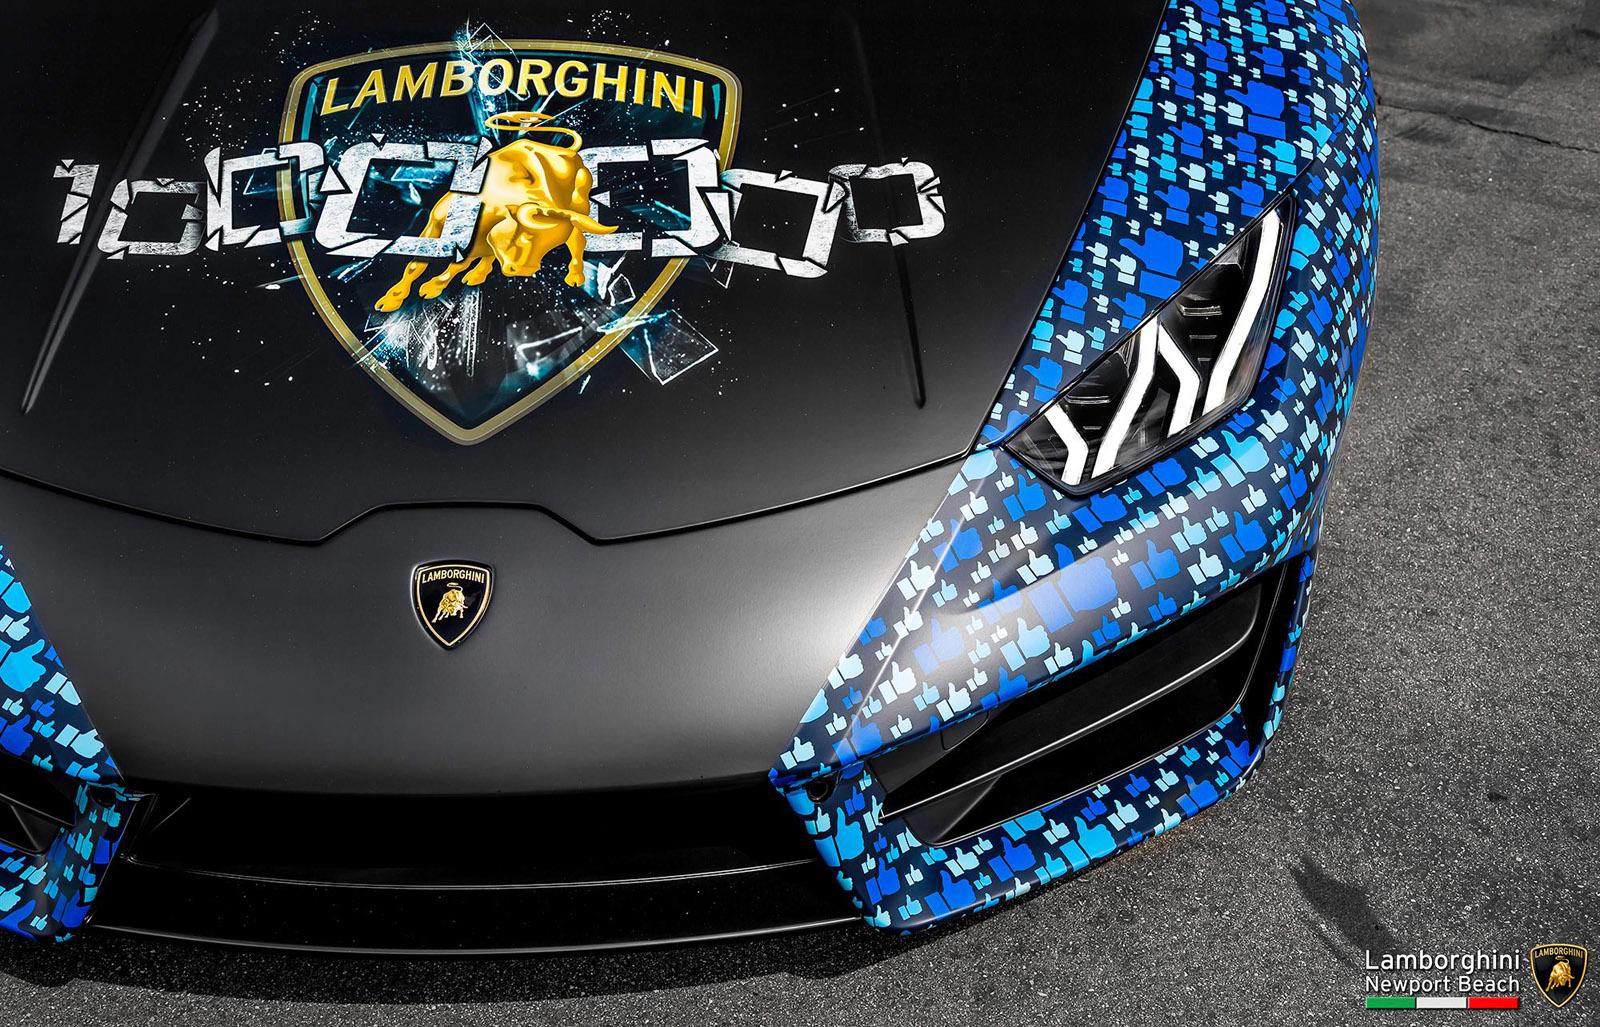 Lamborghini Huracan (livrea milionesimo like su Facebook)